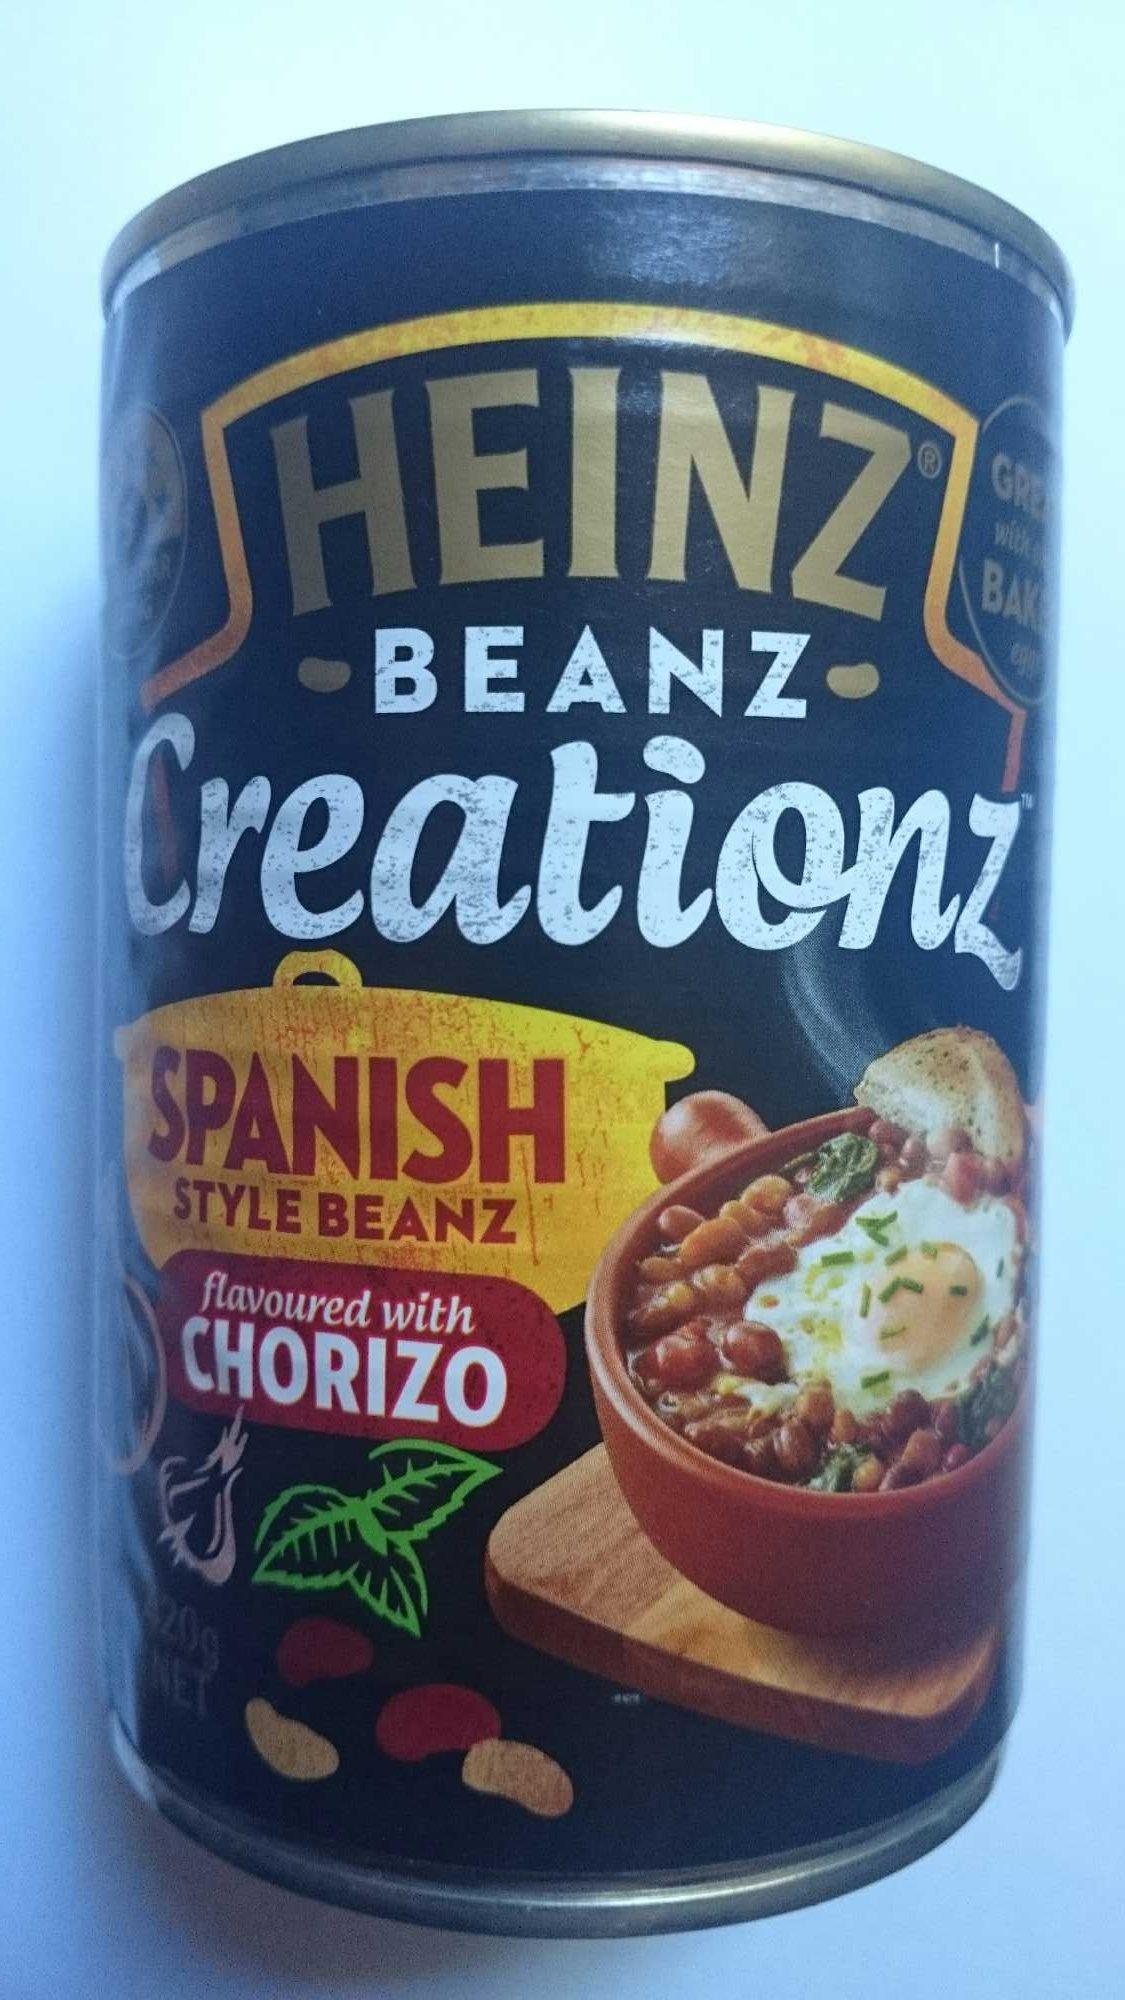 Heinz Beanz Creationz Spanish Style Beaz Chorizo - Product - en